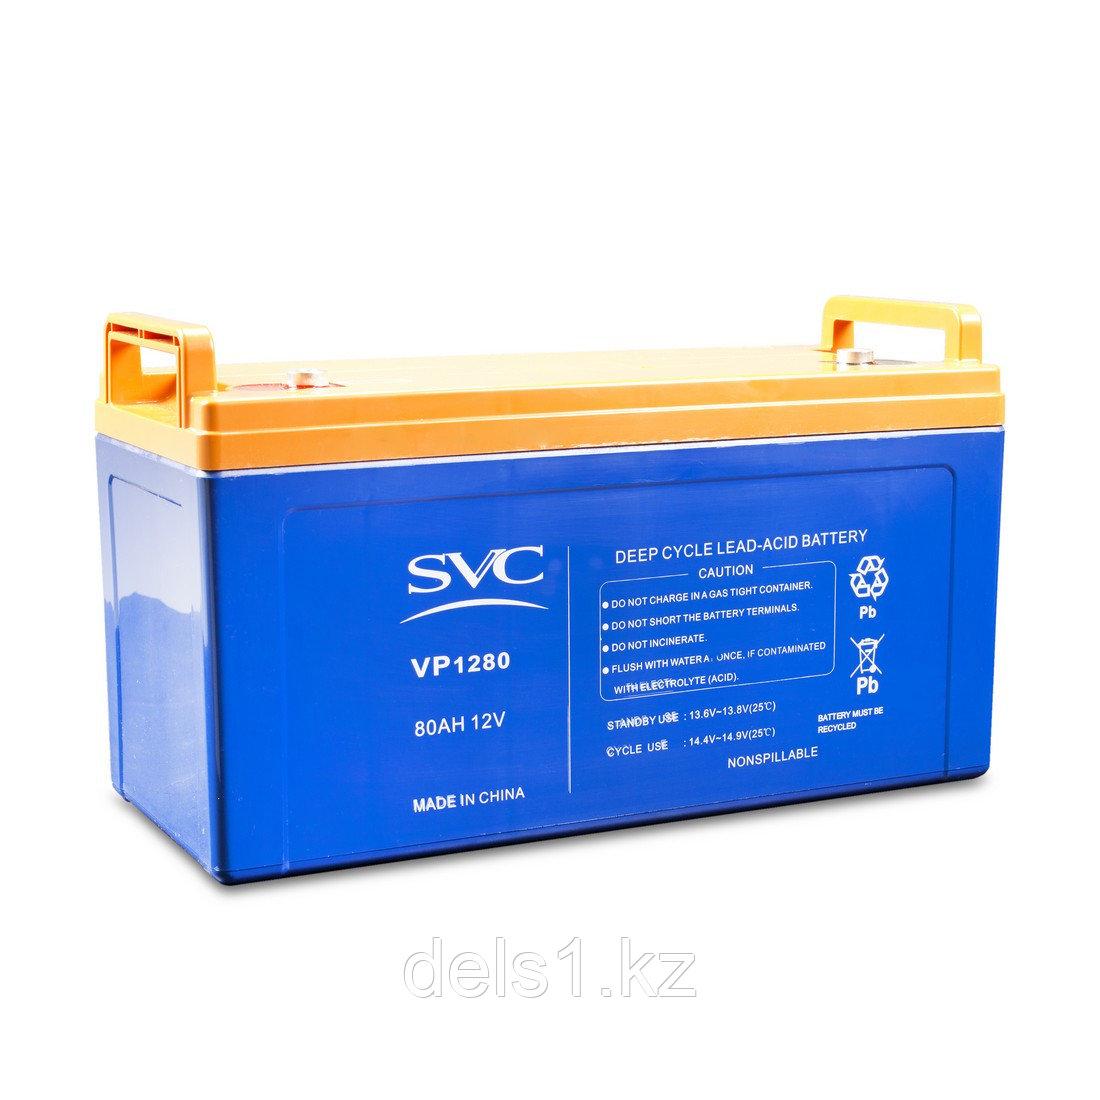 Батарея, SVC, 12В 80 Ач, Размер в мм.: 235*173*406